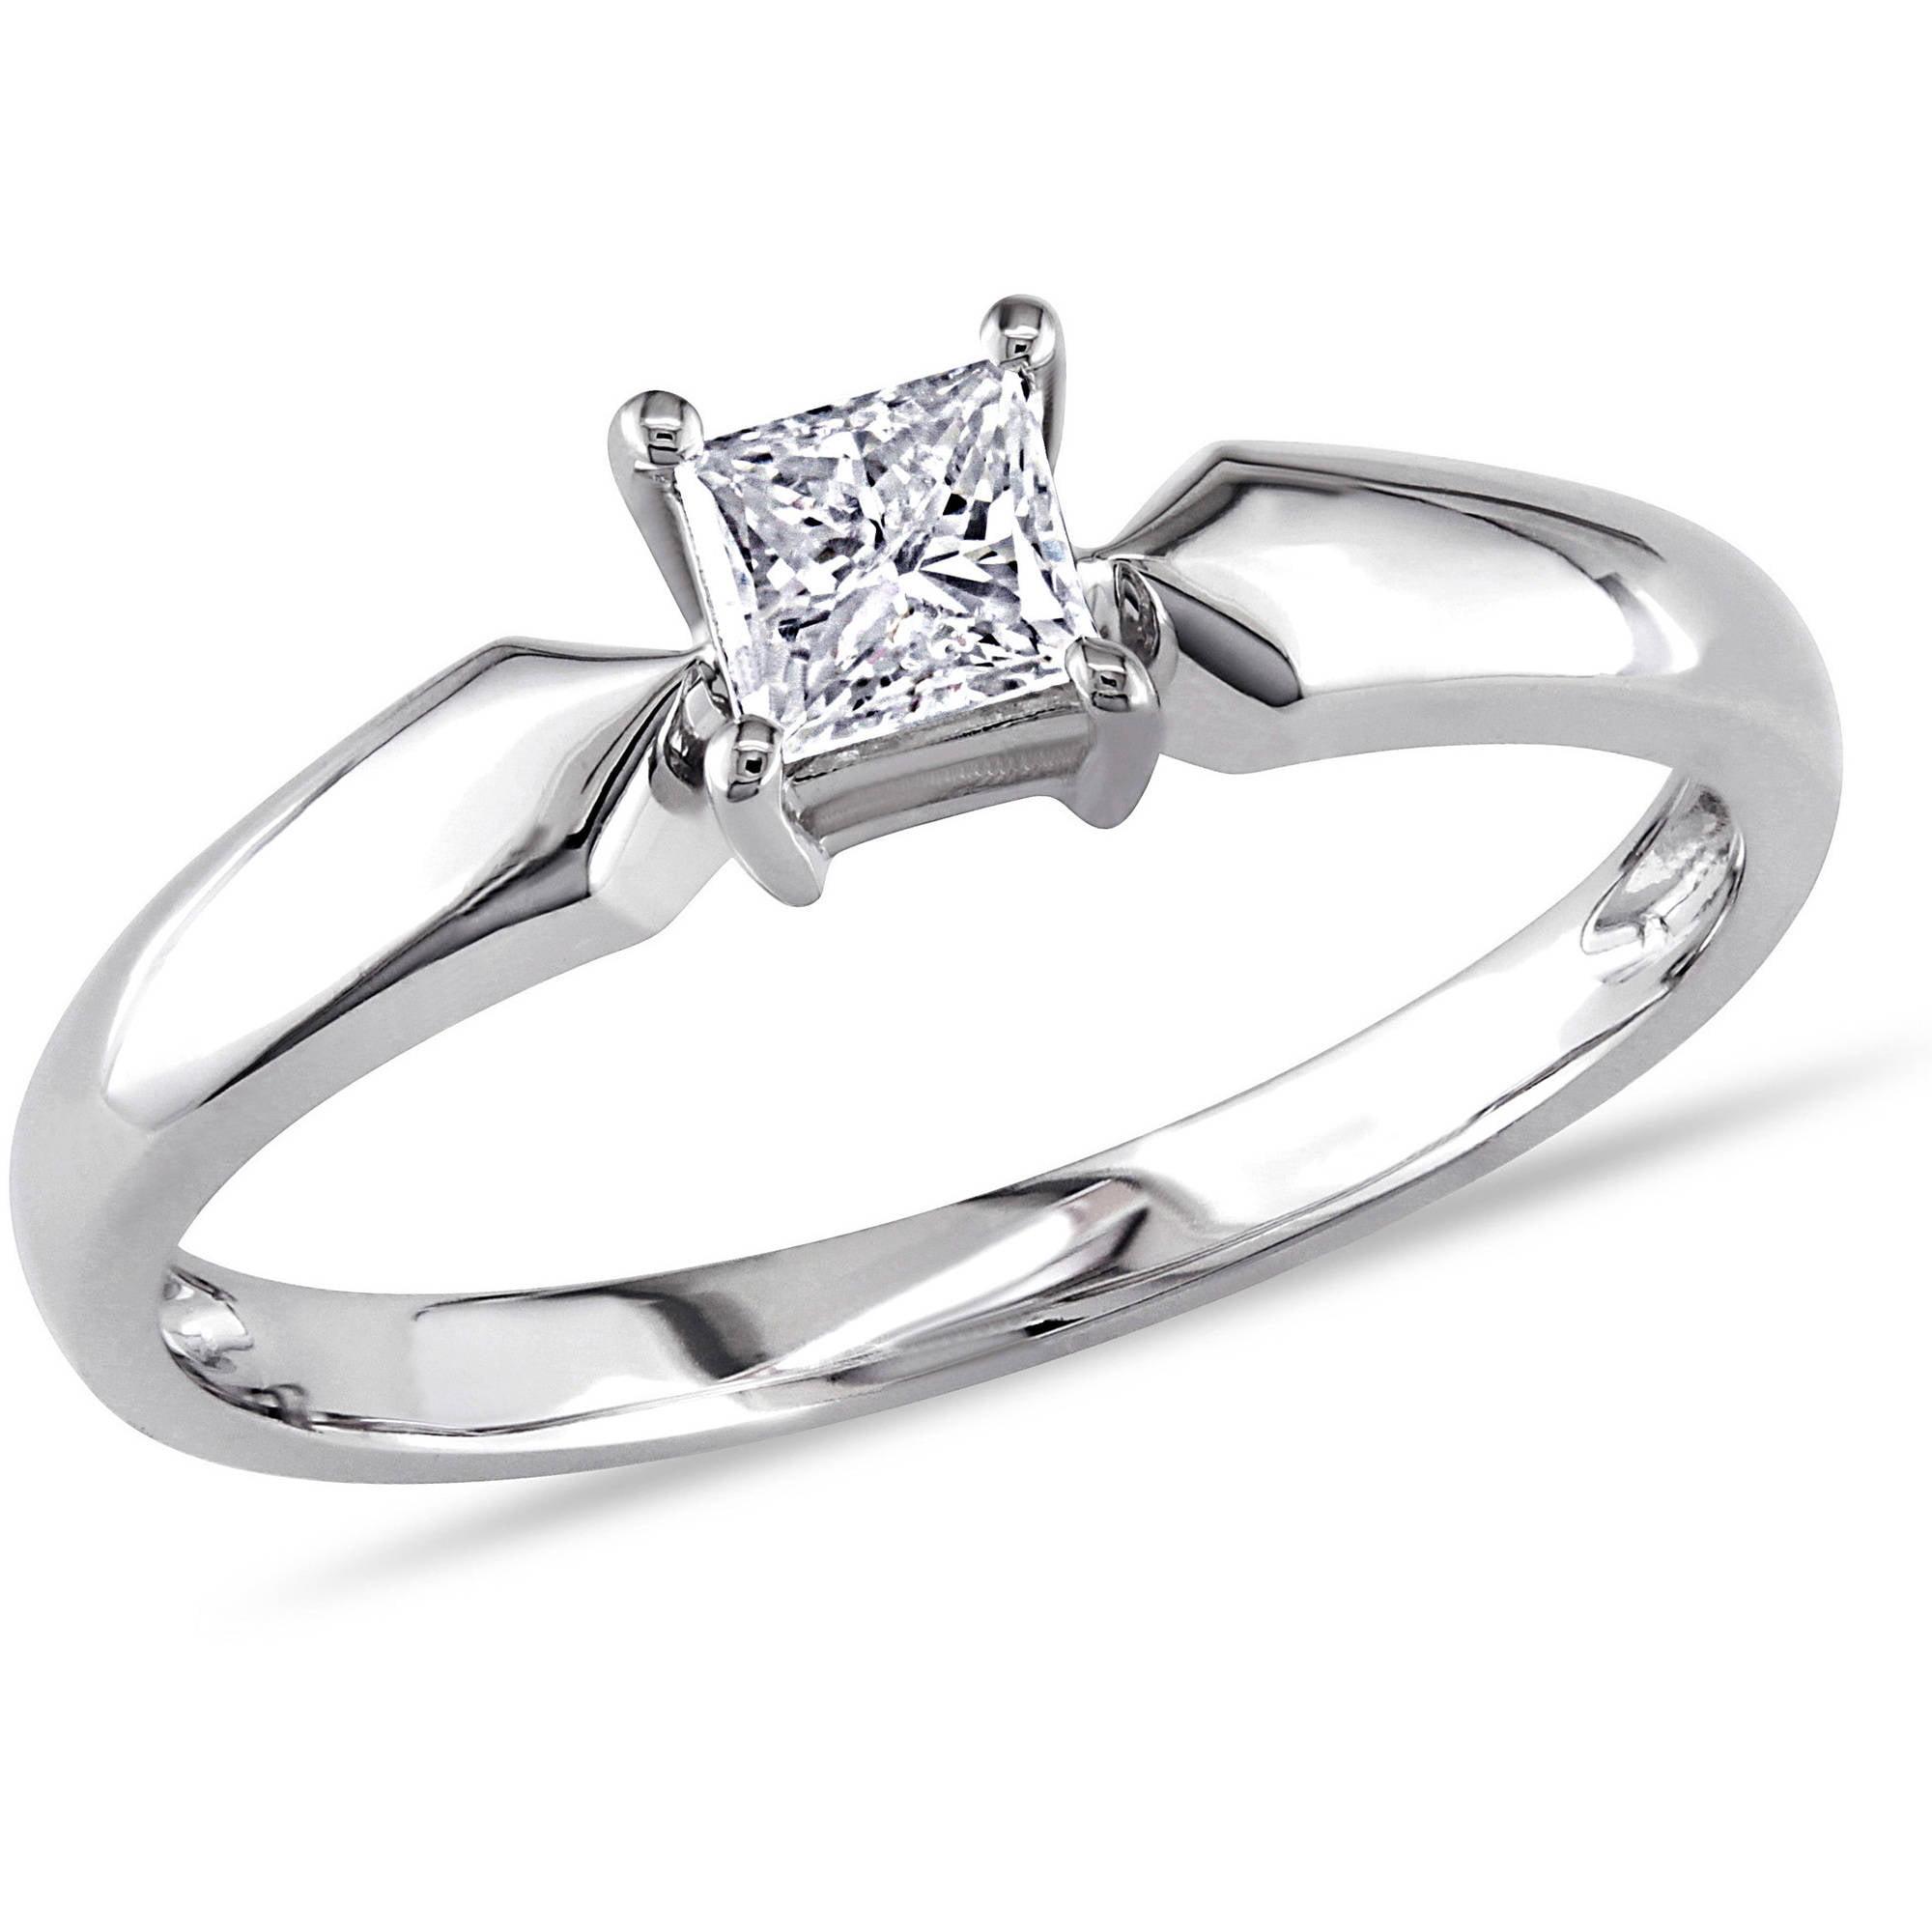 Miabella 1/3 Carat T.W. Princess Cut Diamond Solitaire Ring in 10kt White Gold